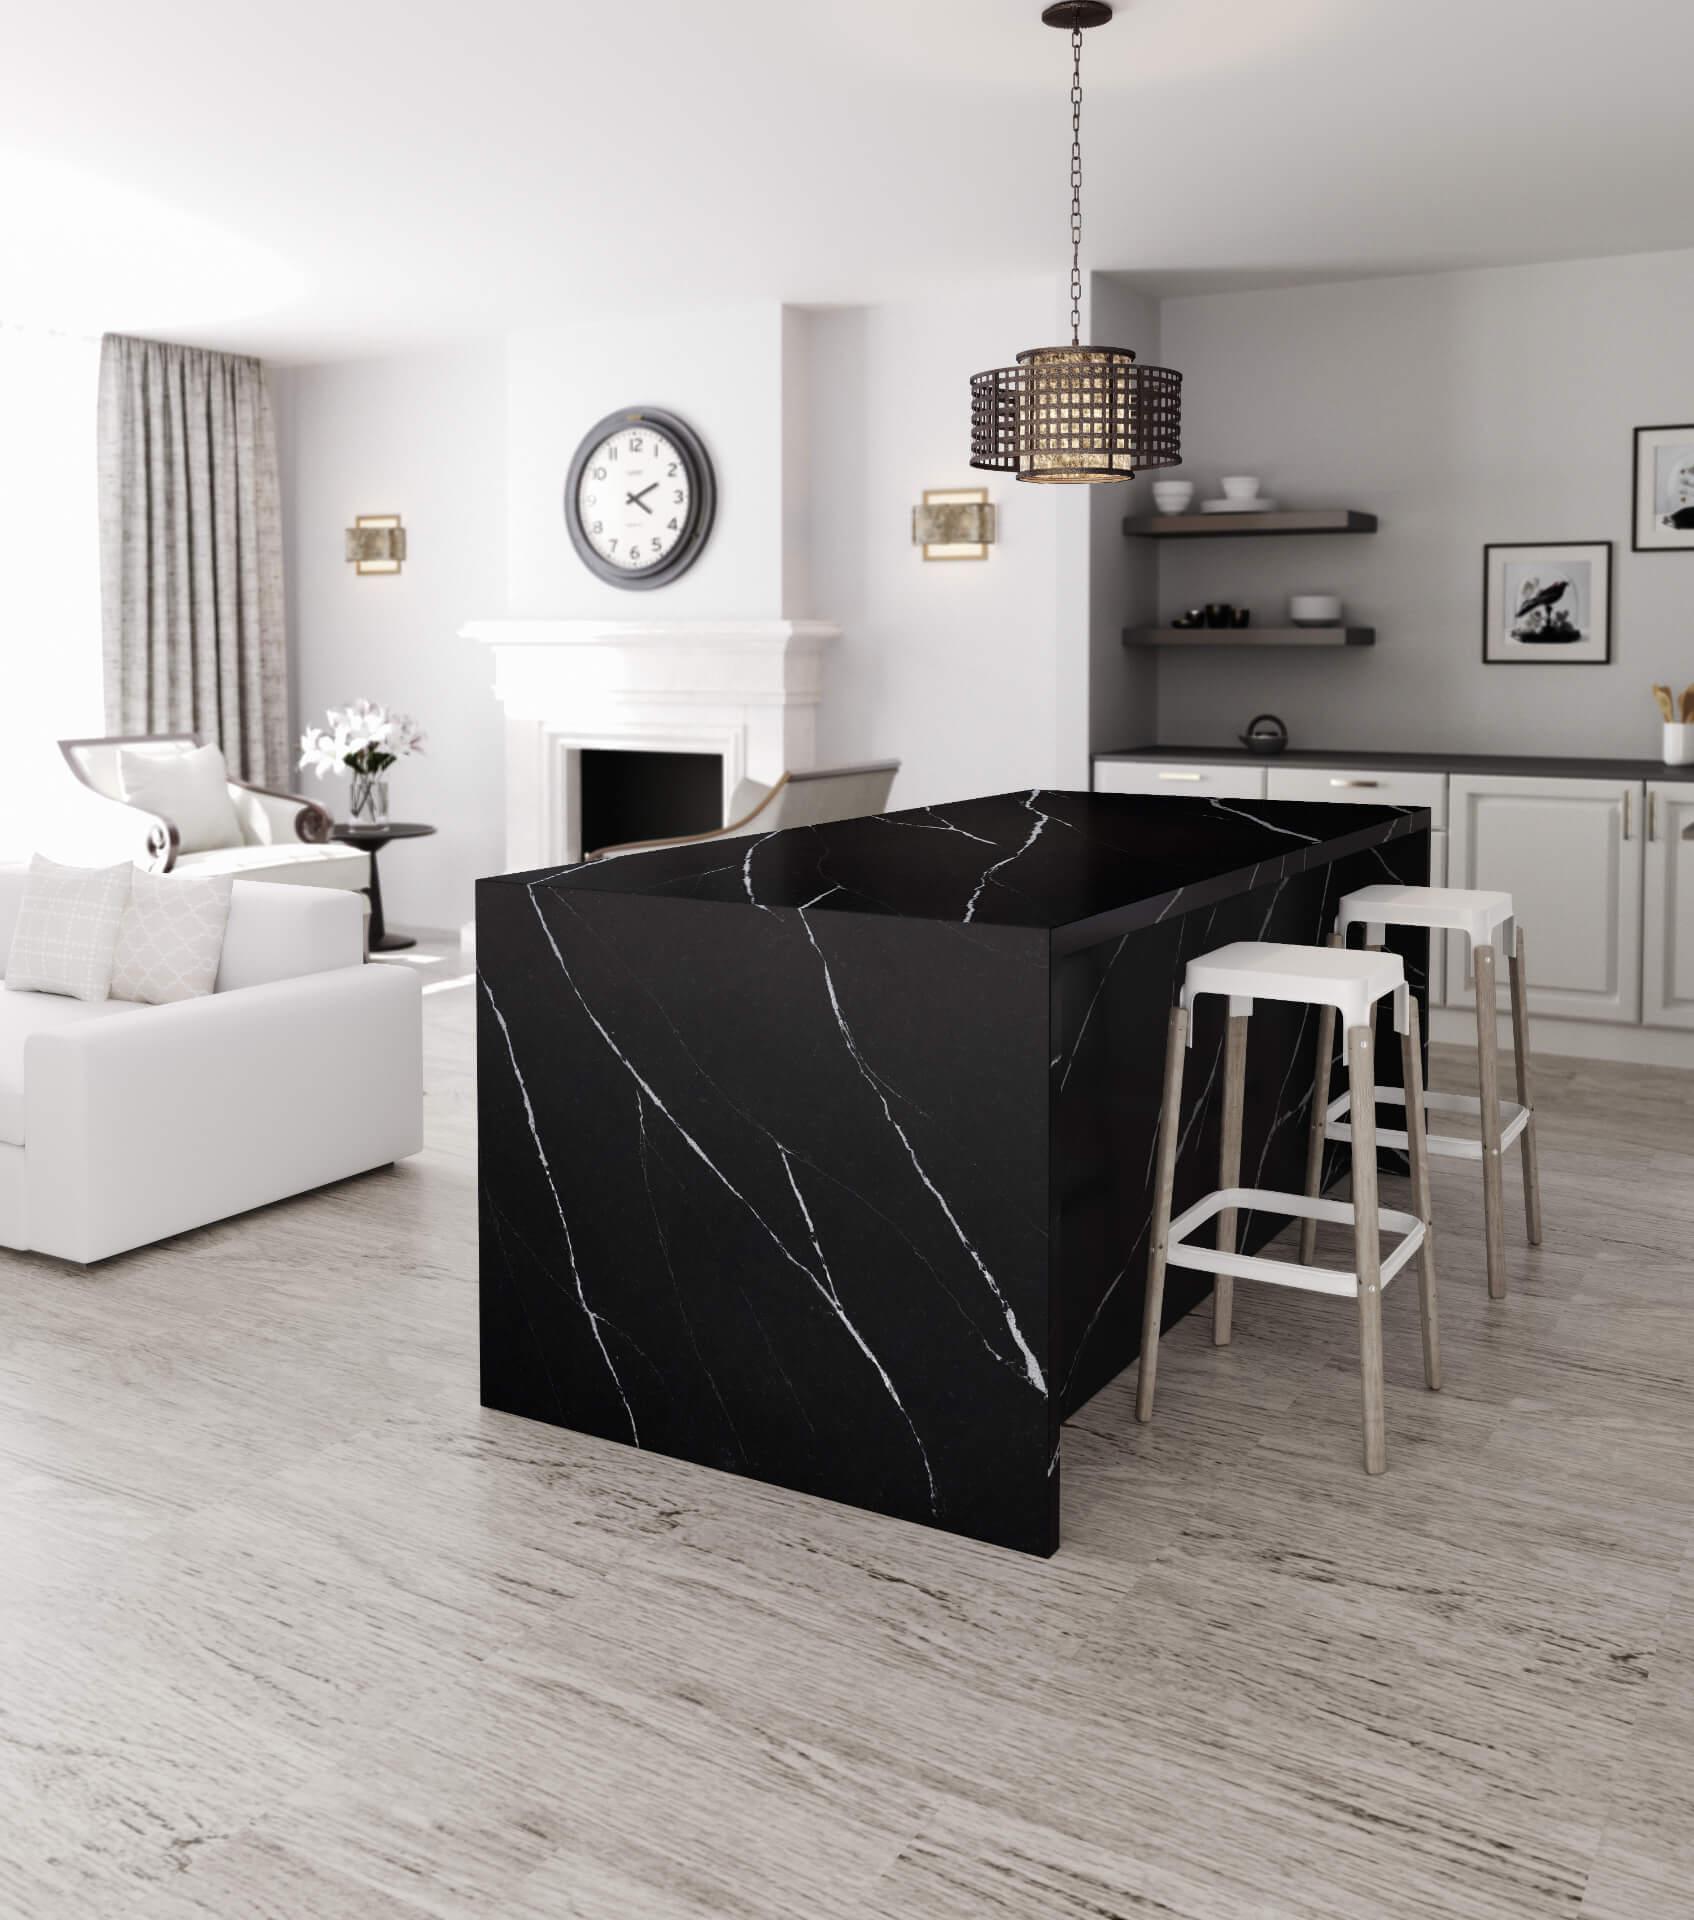 Cosentino Silestone Marble Black Kitchen